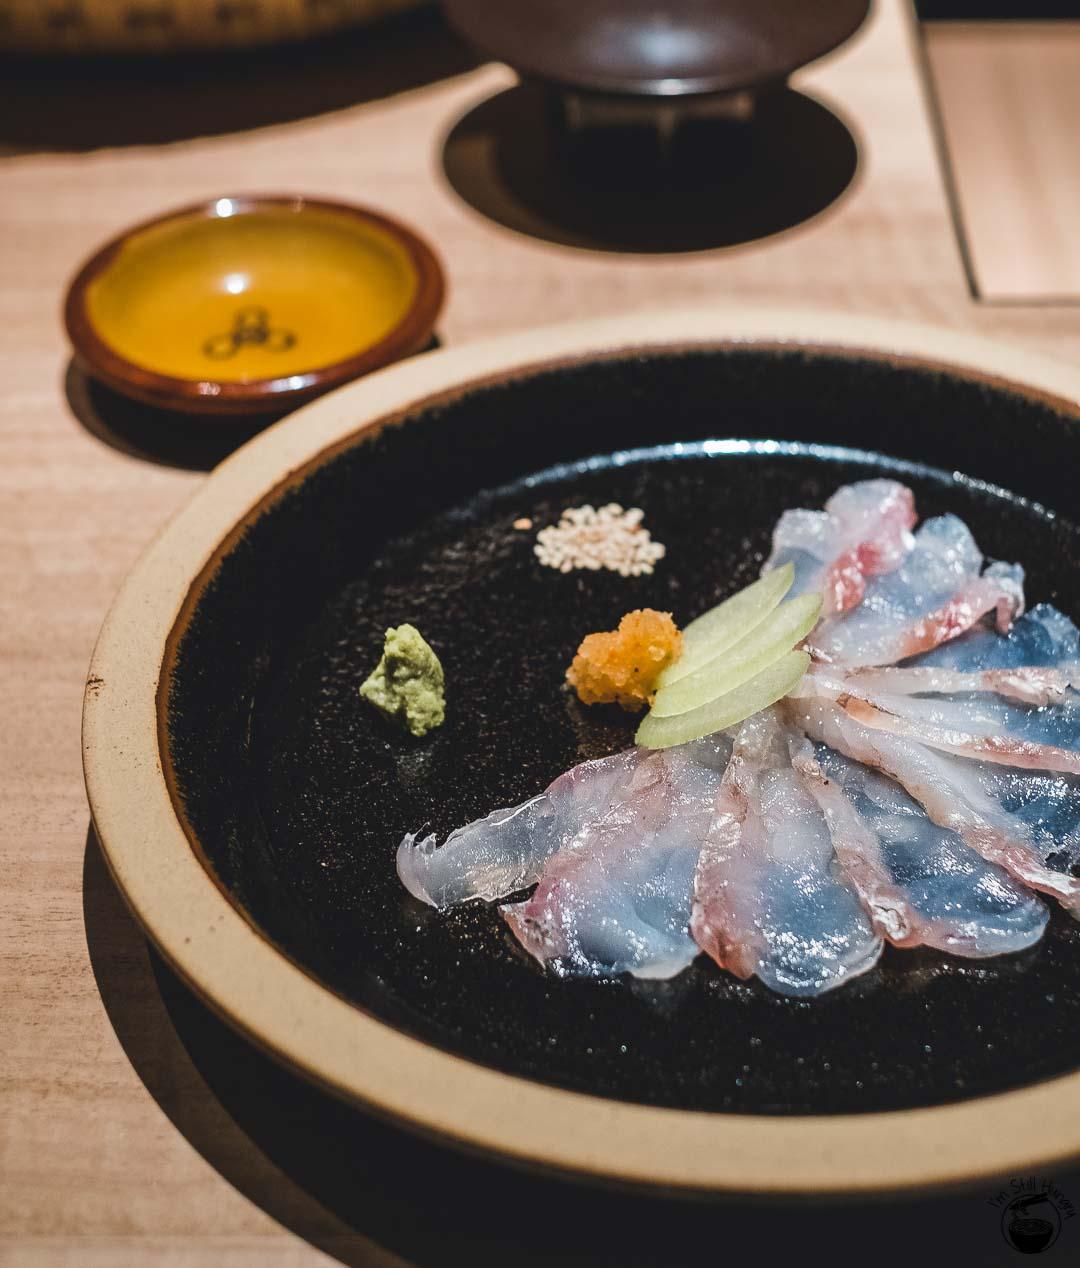 Restaurant Sasaki Surry Hills Second Visit-3 Gurnard, sakura & kombu